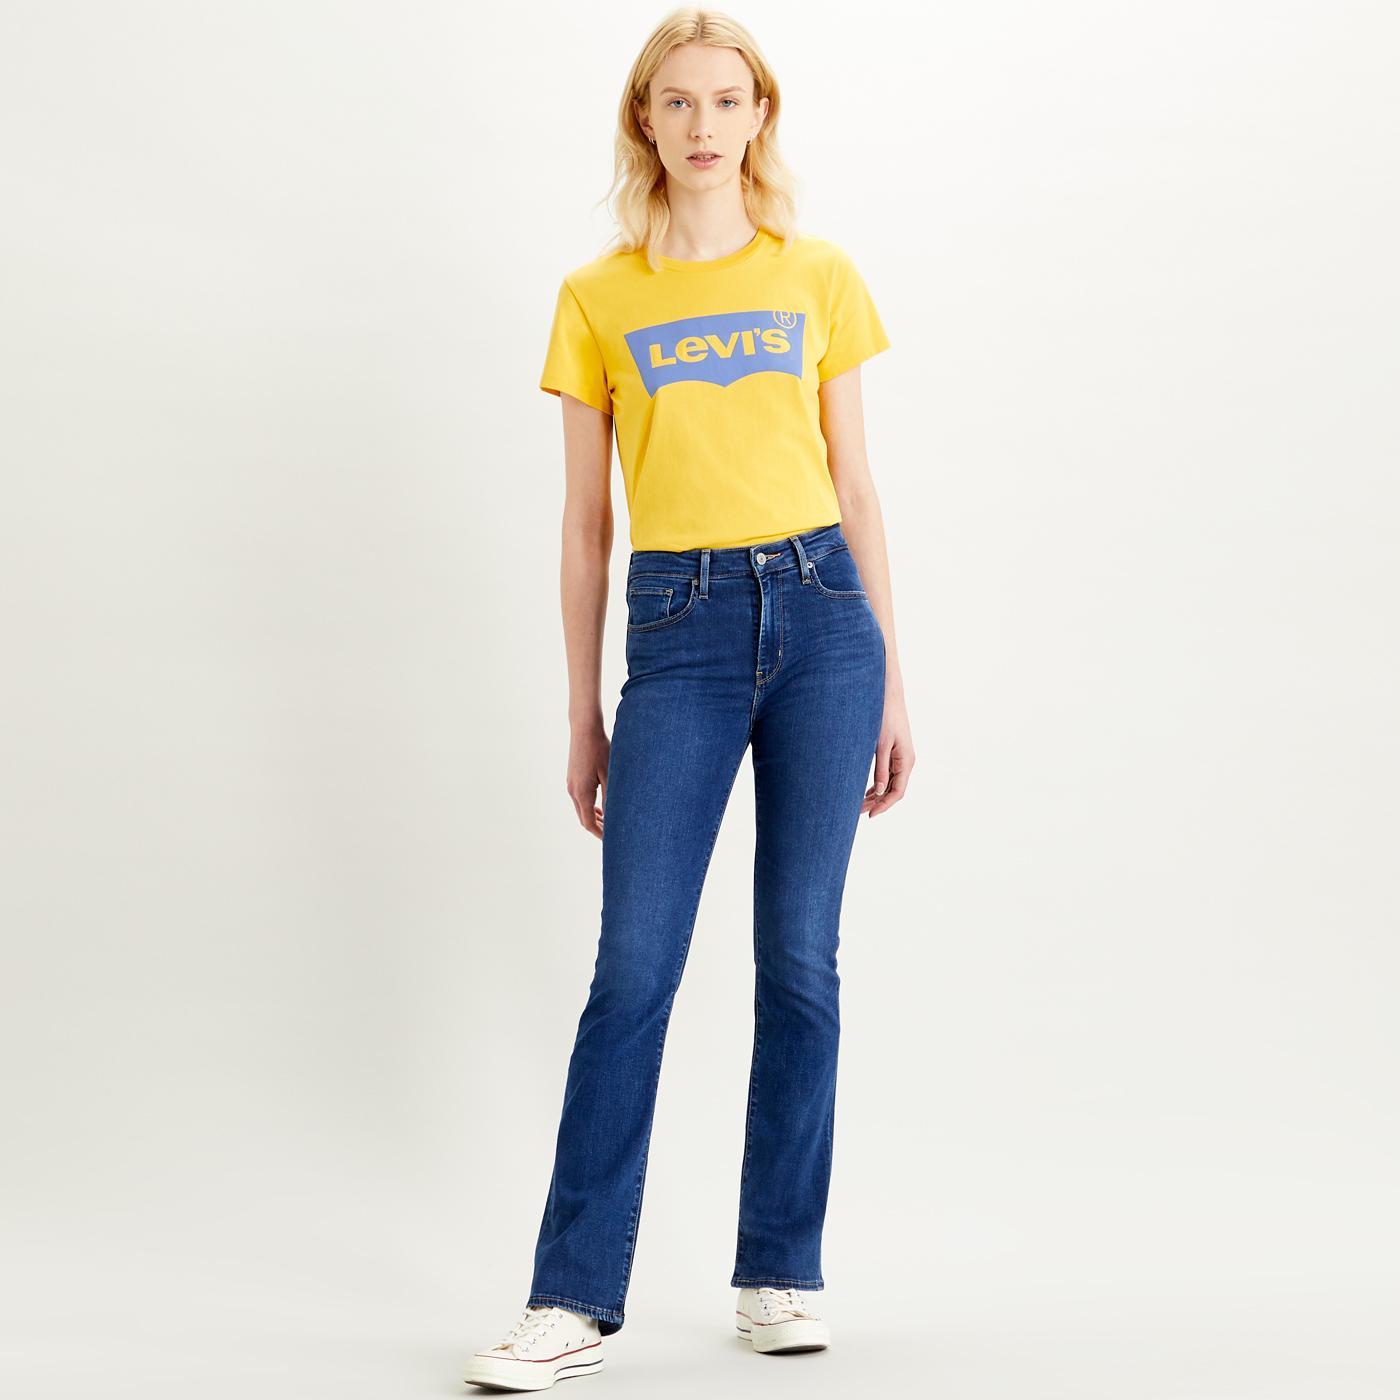 LEVI'S 725 High Waist Bootcut Jeans BOGOTA TRICKS